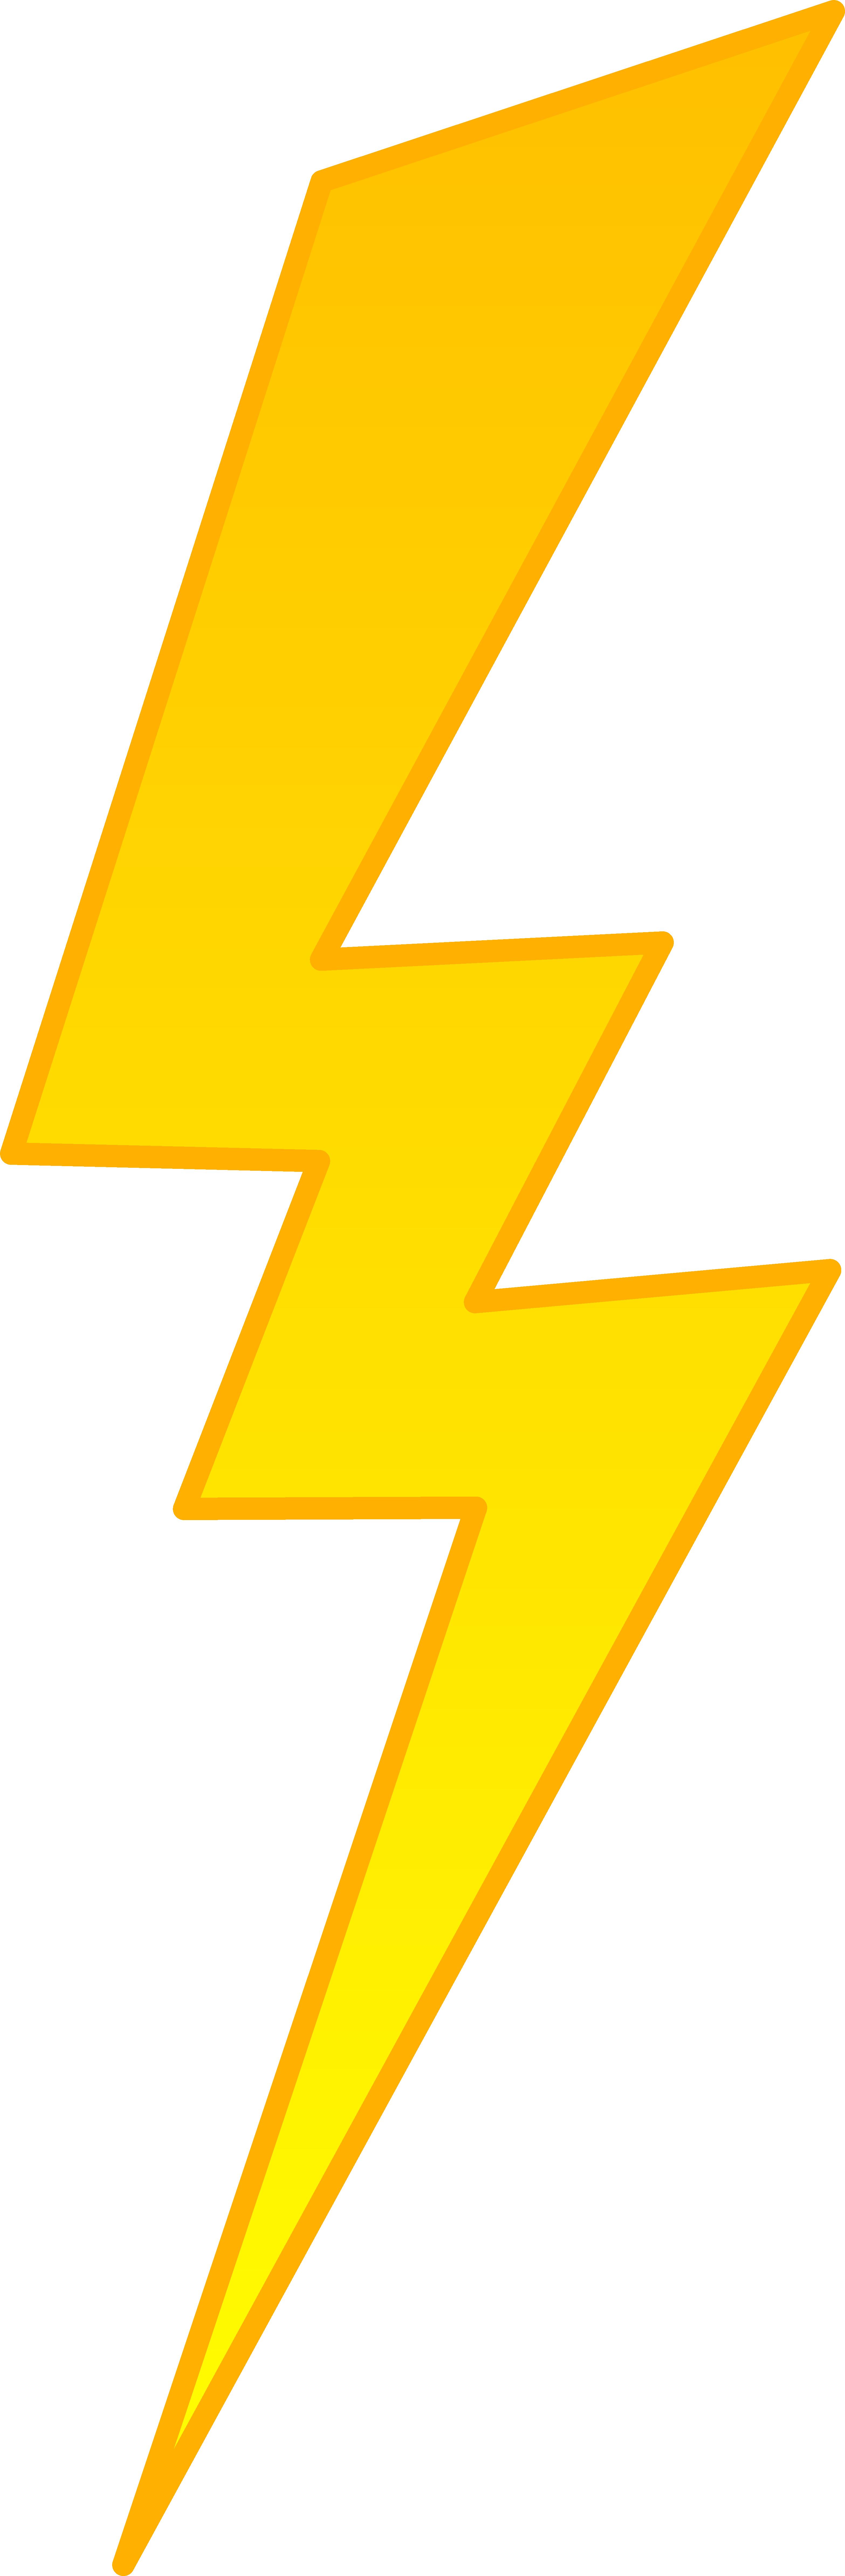 jpg transparent library Golden lightning symbol free. Bolt clipart gold